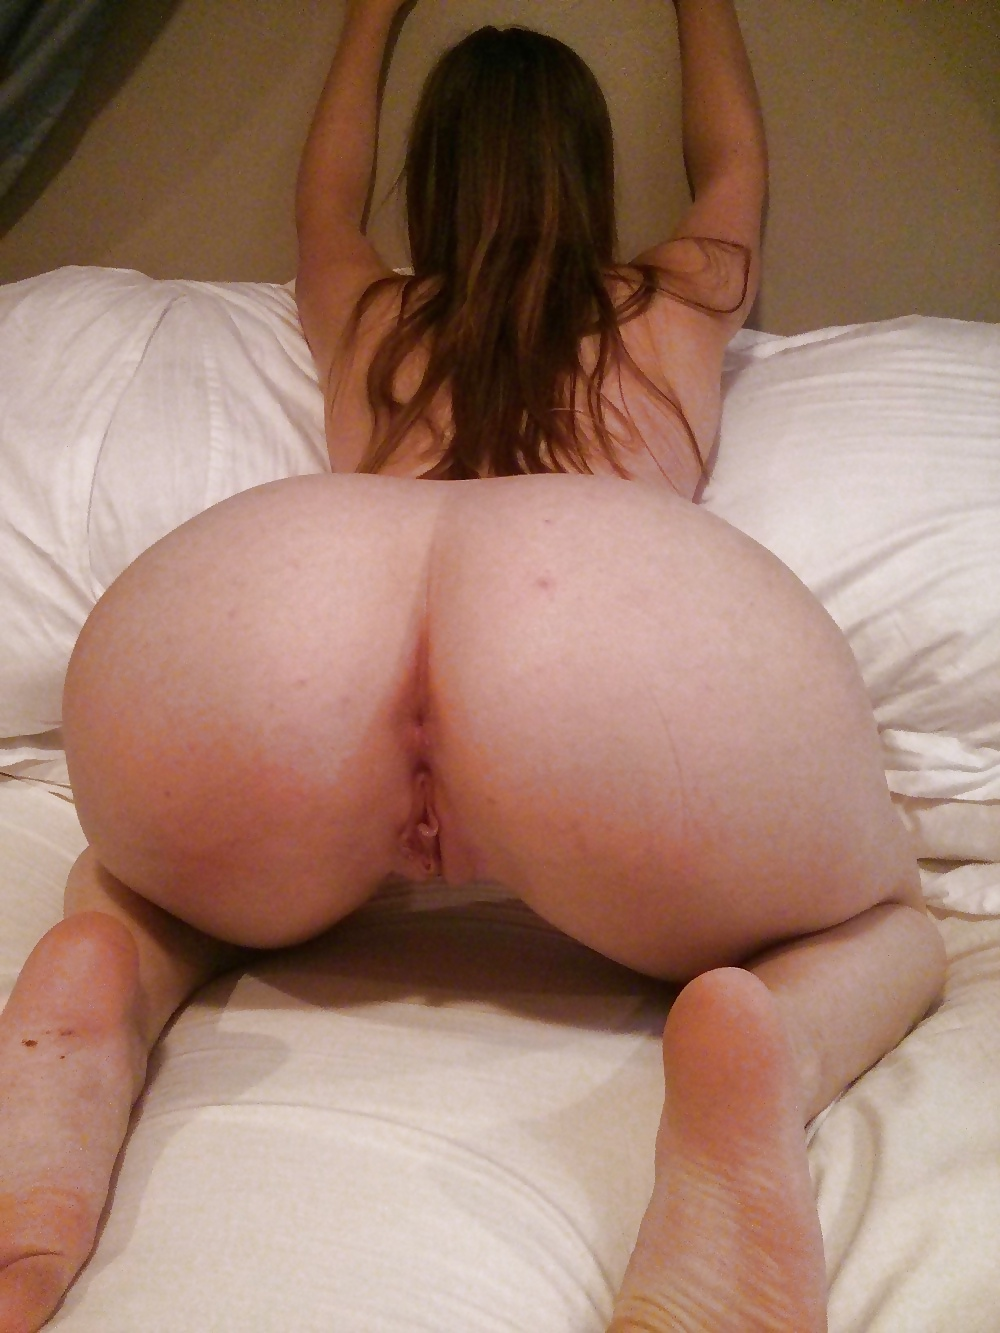 Big ass white girl fucking dildo